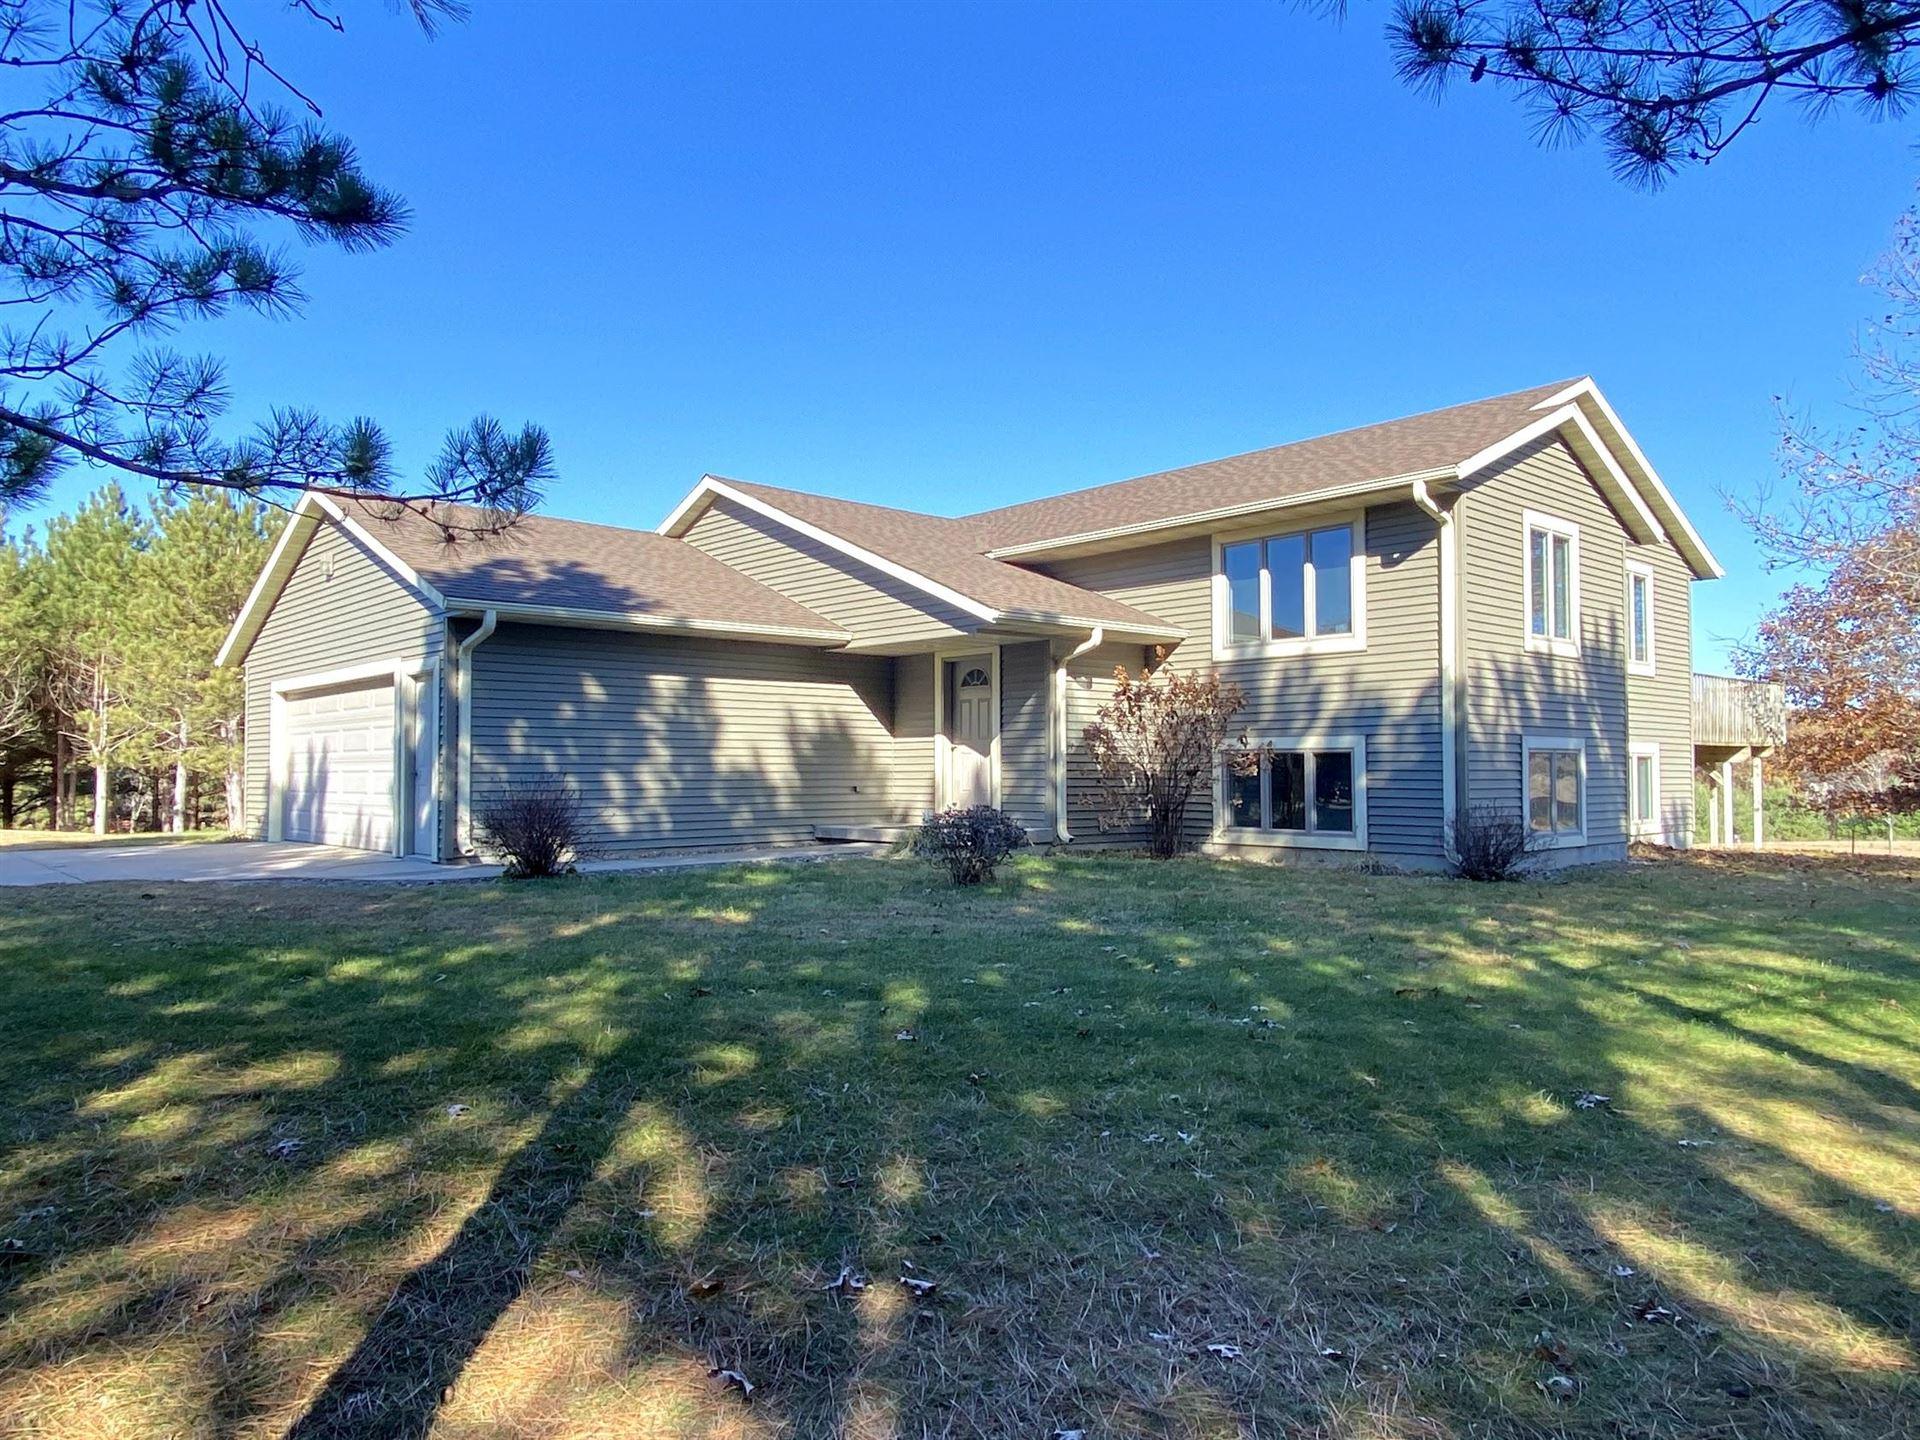 W22925 Prairie Wood DR, Caledonia, WI 54661 - MLS#: 1716676